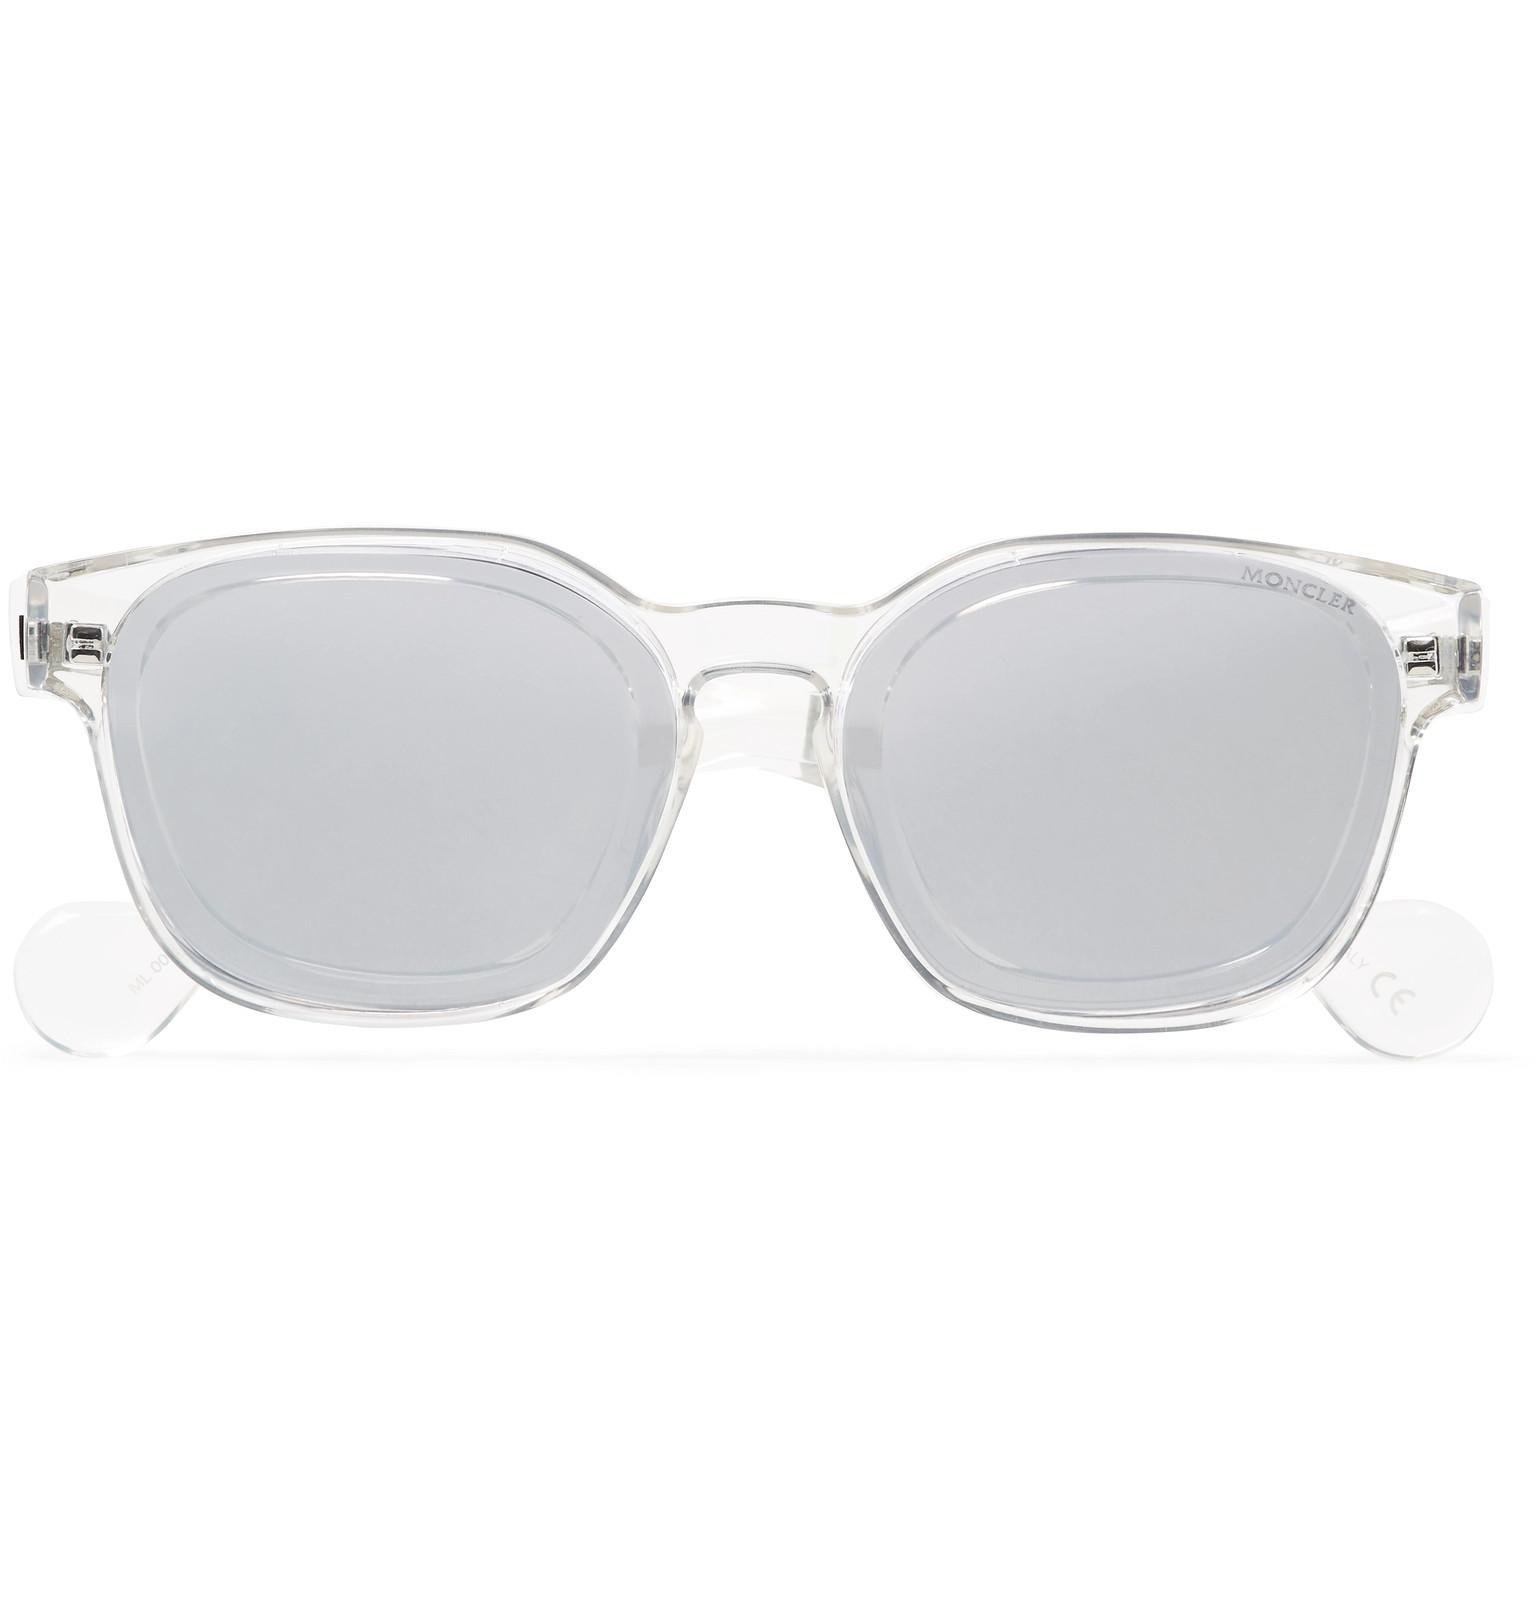 Moncler Square Square Frame Moncler Acetate Sunglasses pW8Fz1n8